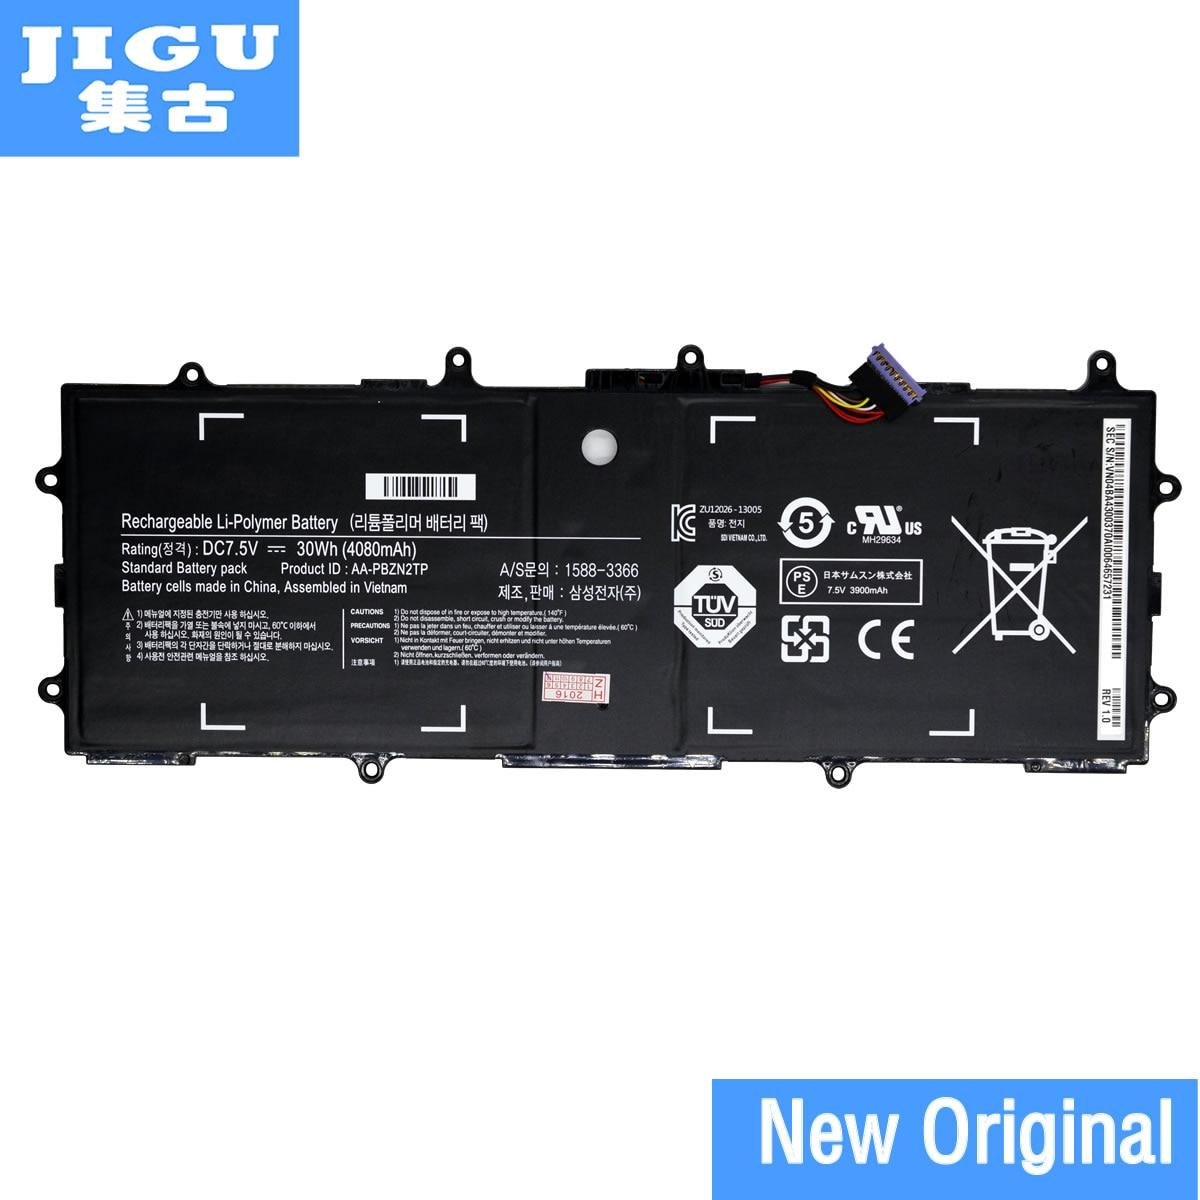 JIGU new genuine AA-PBZN2TP Batteria per Samsung Chromebook XE500T1C 905 s 915 s 905s3g XE303 XE303C12 7.5 v 4080 mah